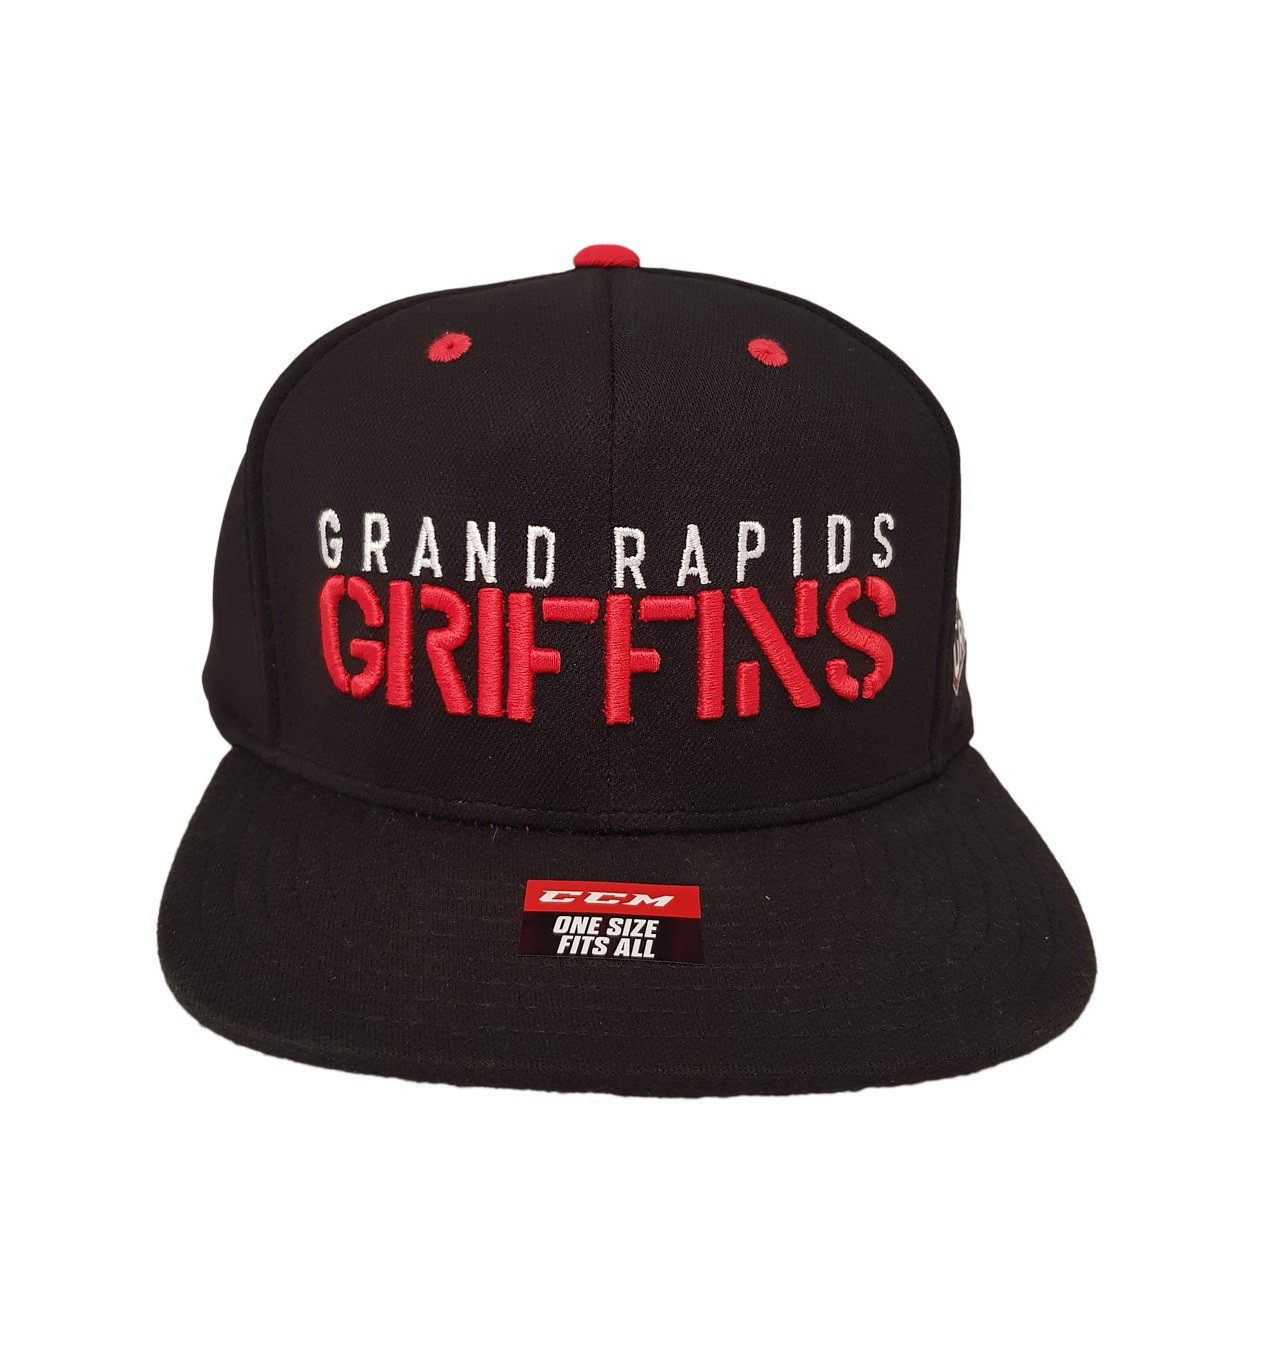 CCM Grand Rapids Griffins Flat Brim Vasaras Cepure